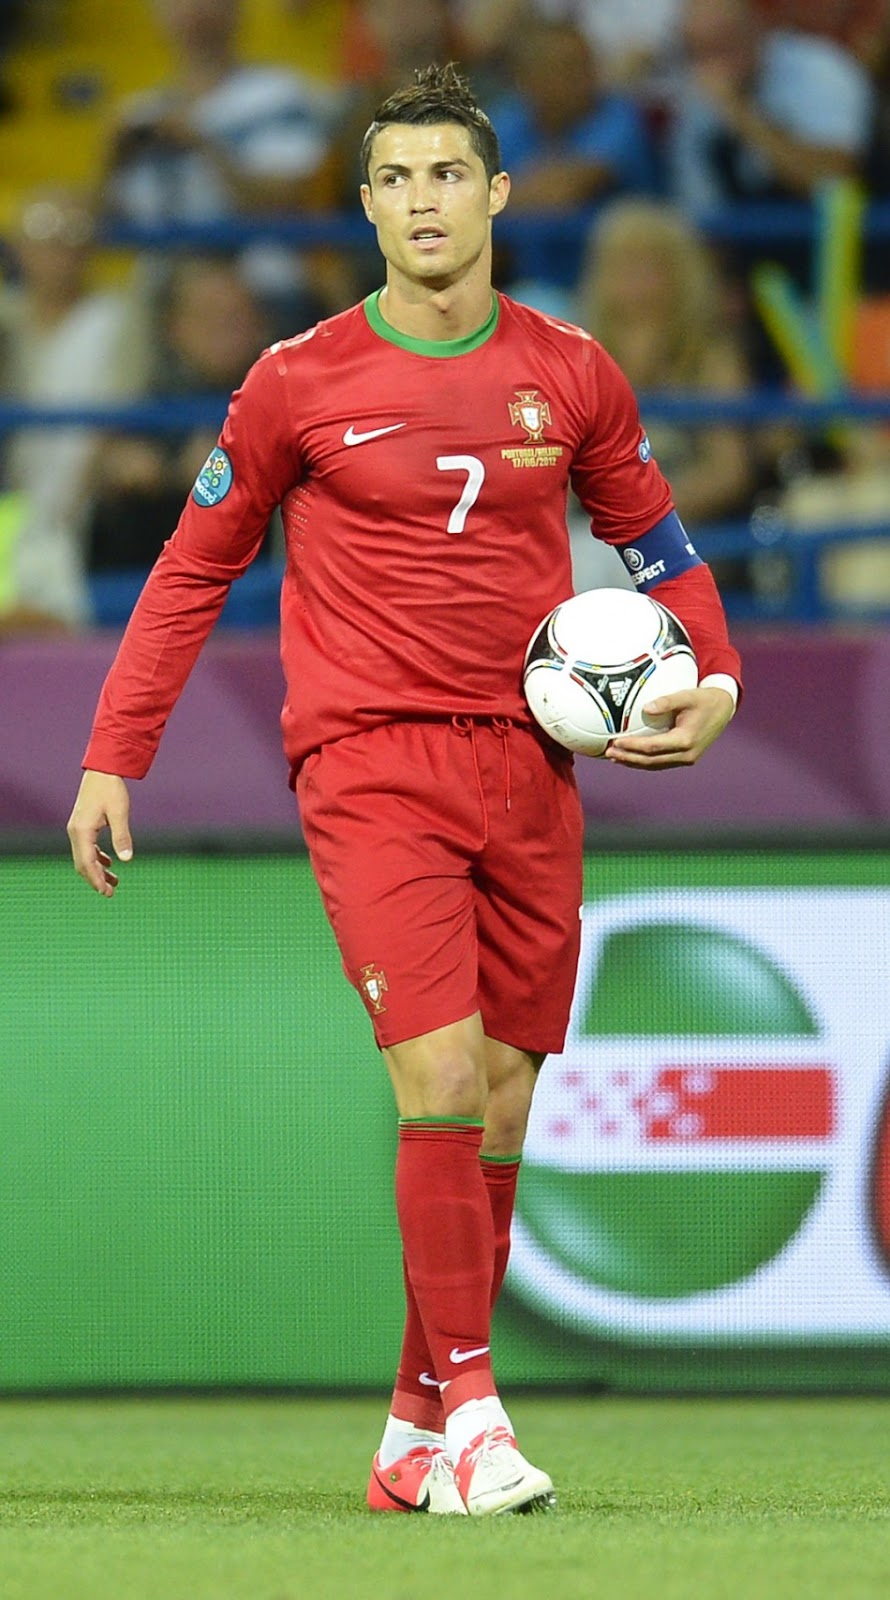 Football: Cristiano Ronaldo